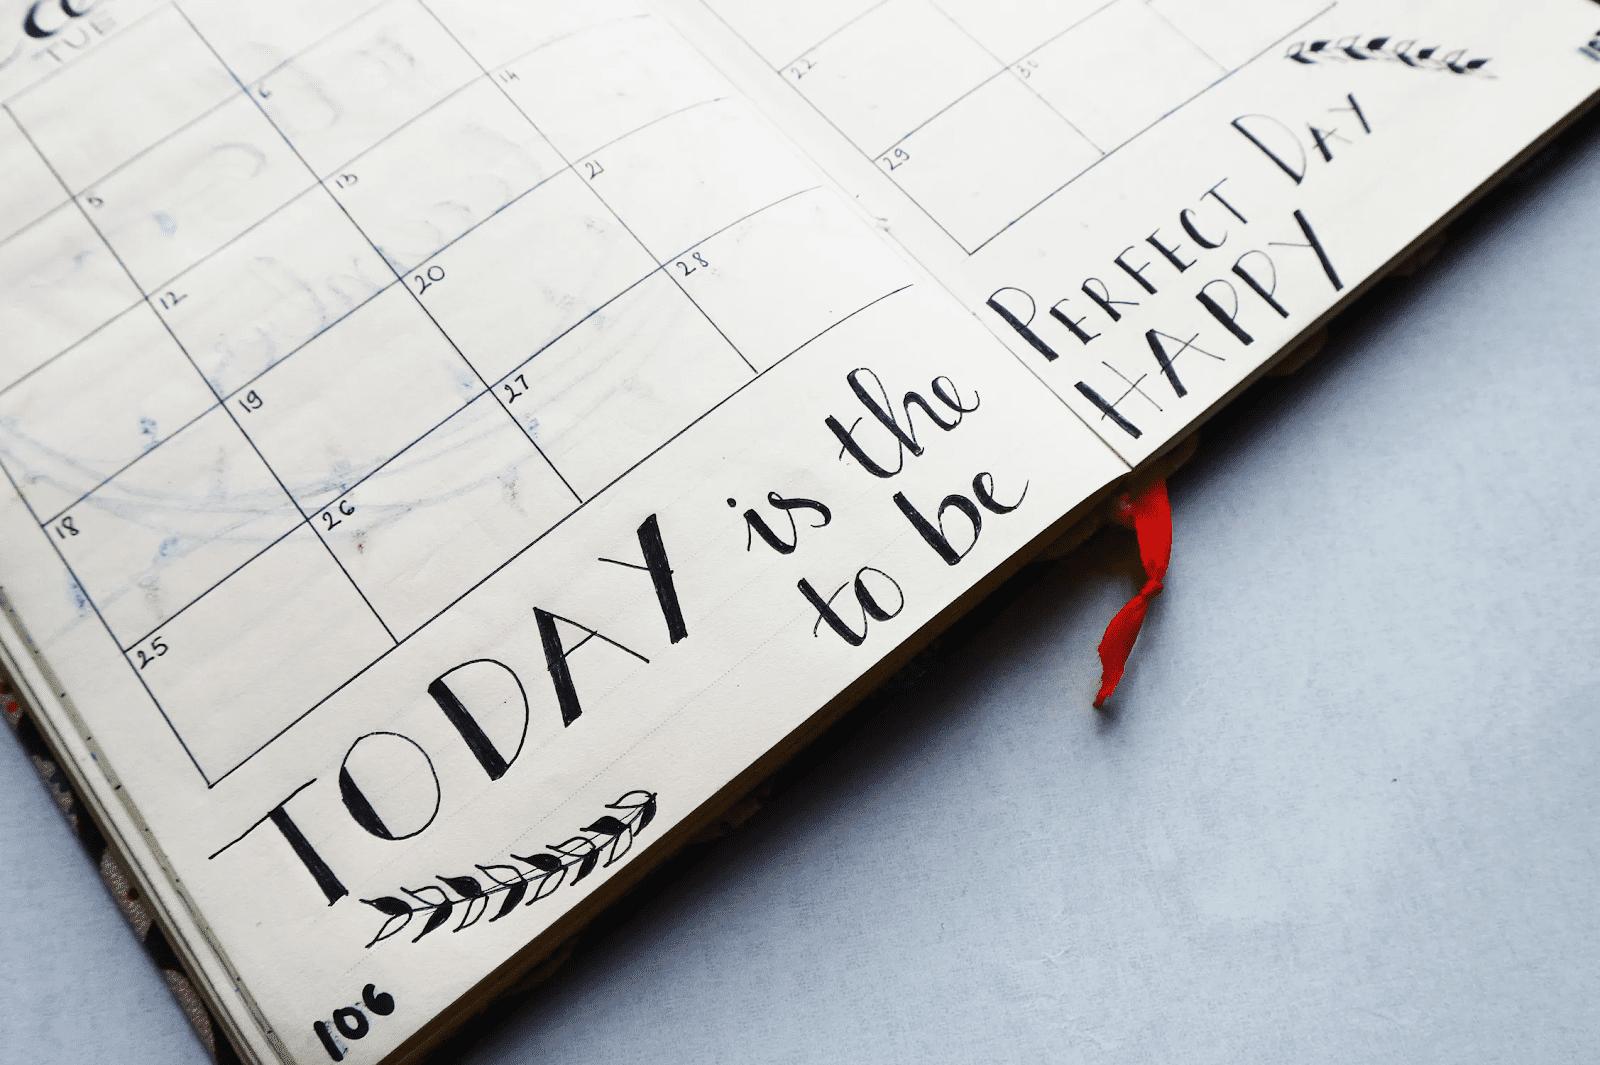 Calendar for creating a flex schedule